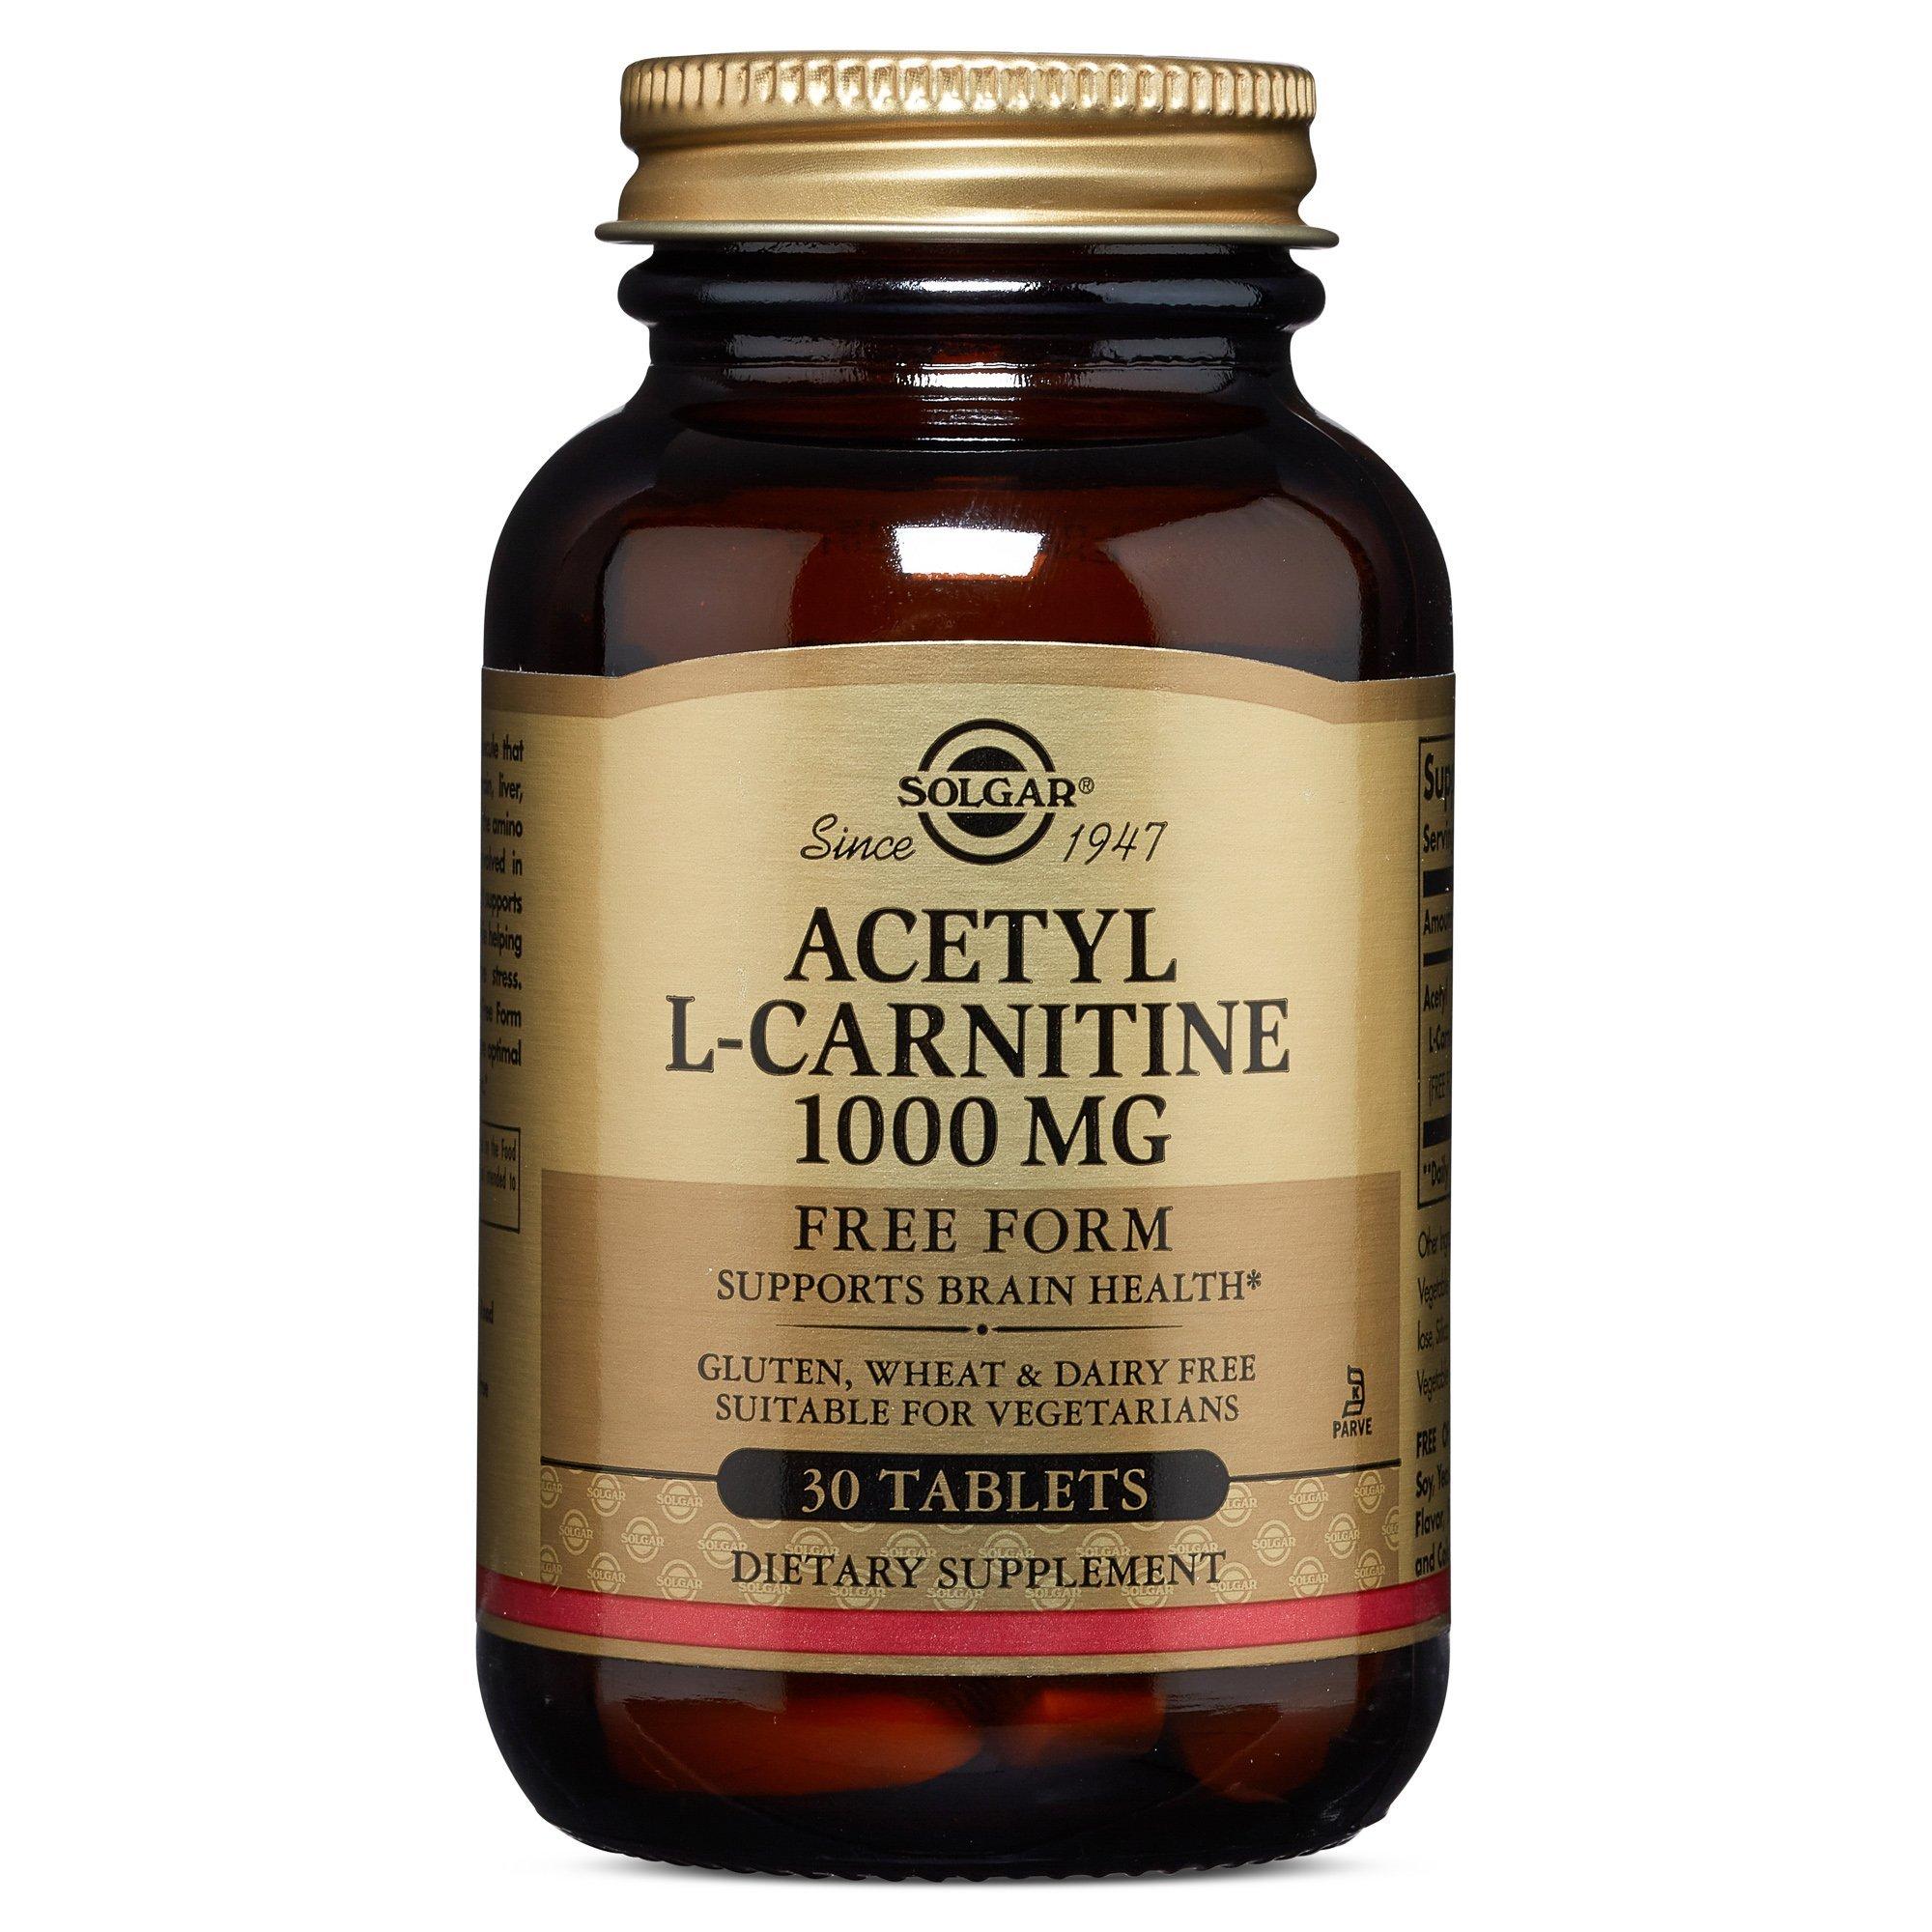 Solgar - Acetyl L-Carnitine 1000 mg, 30 Tablets